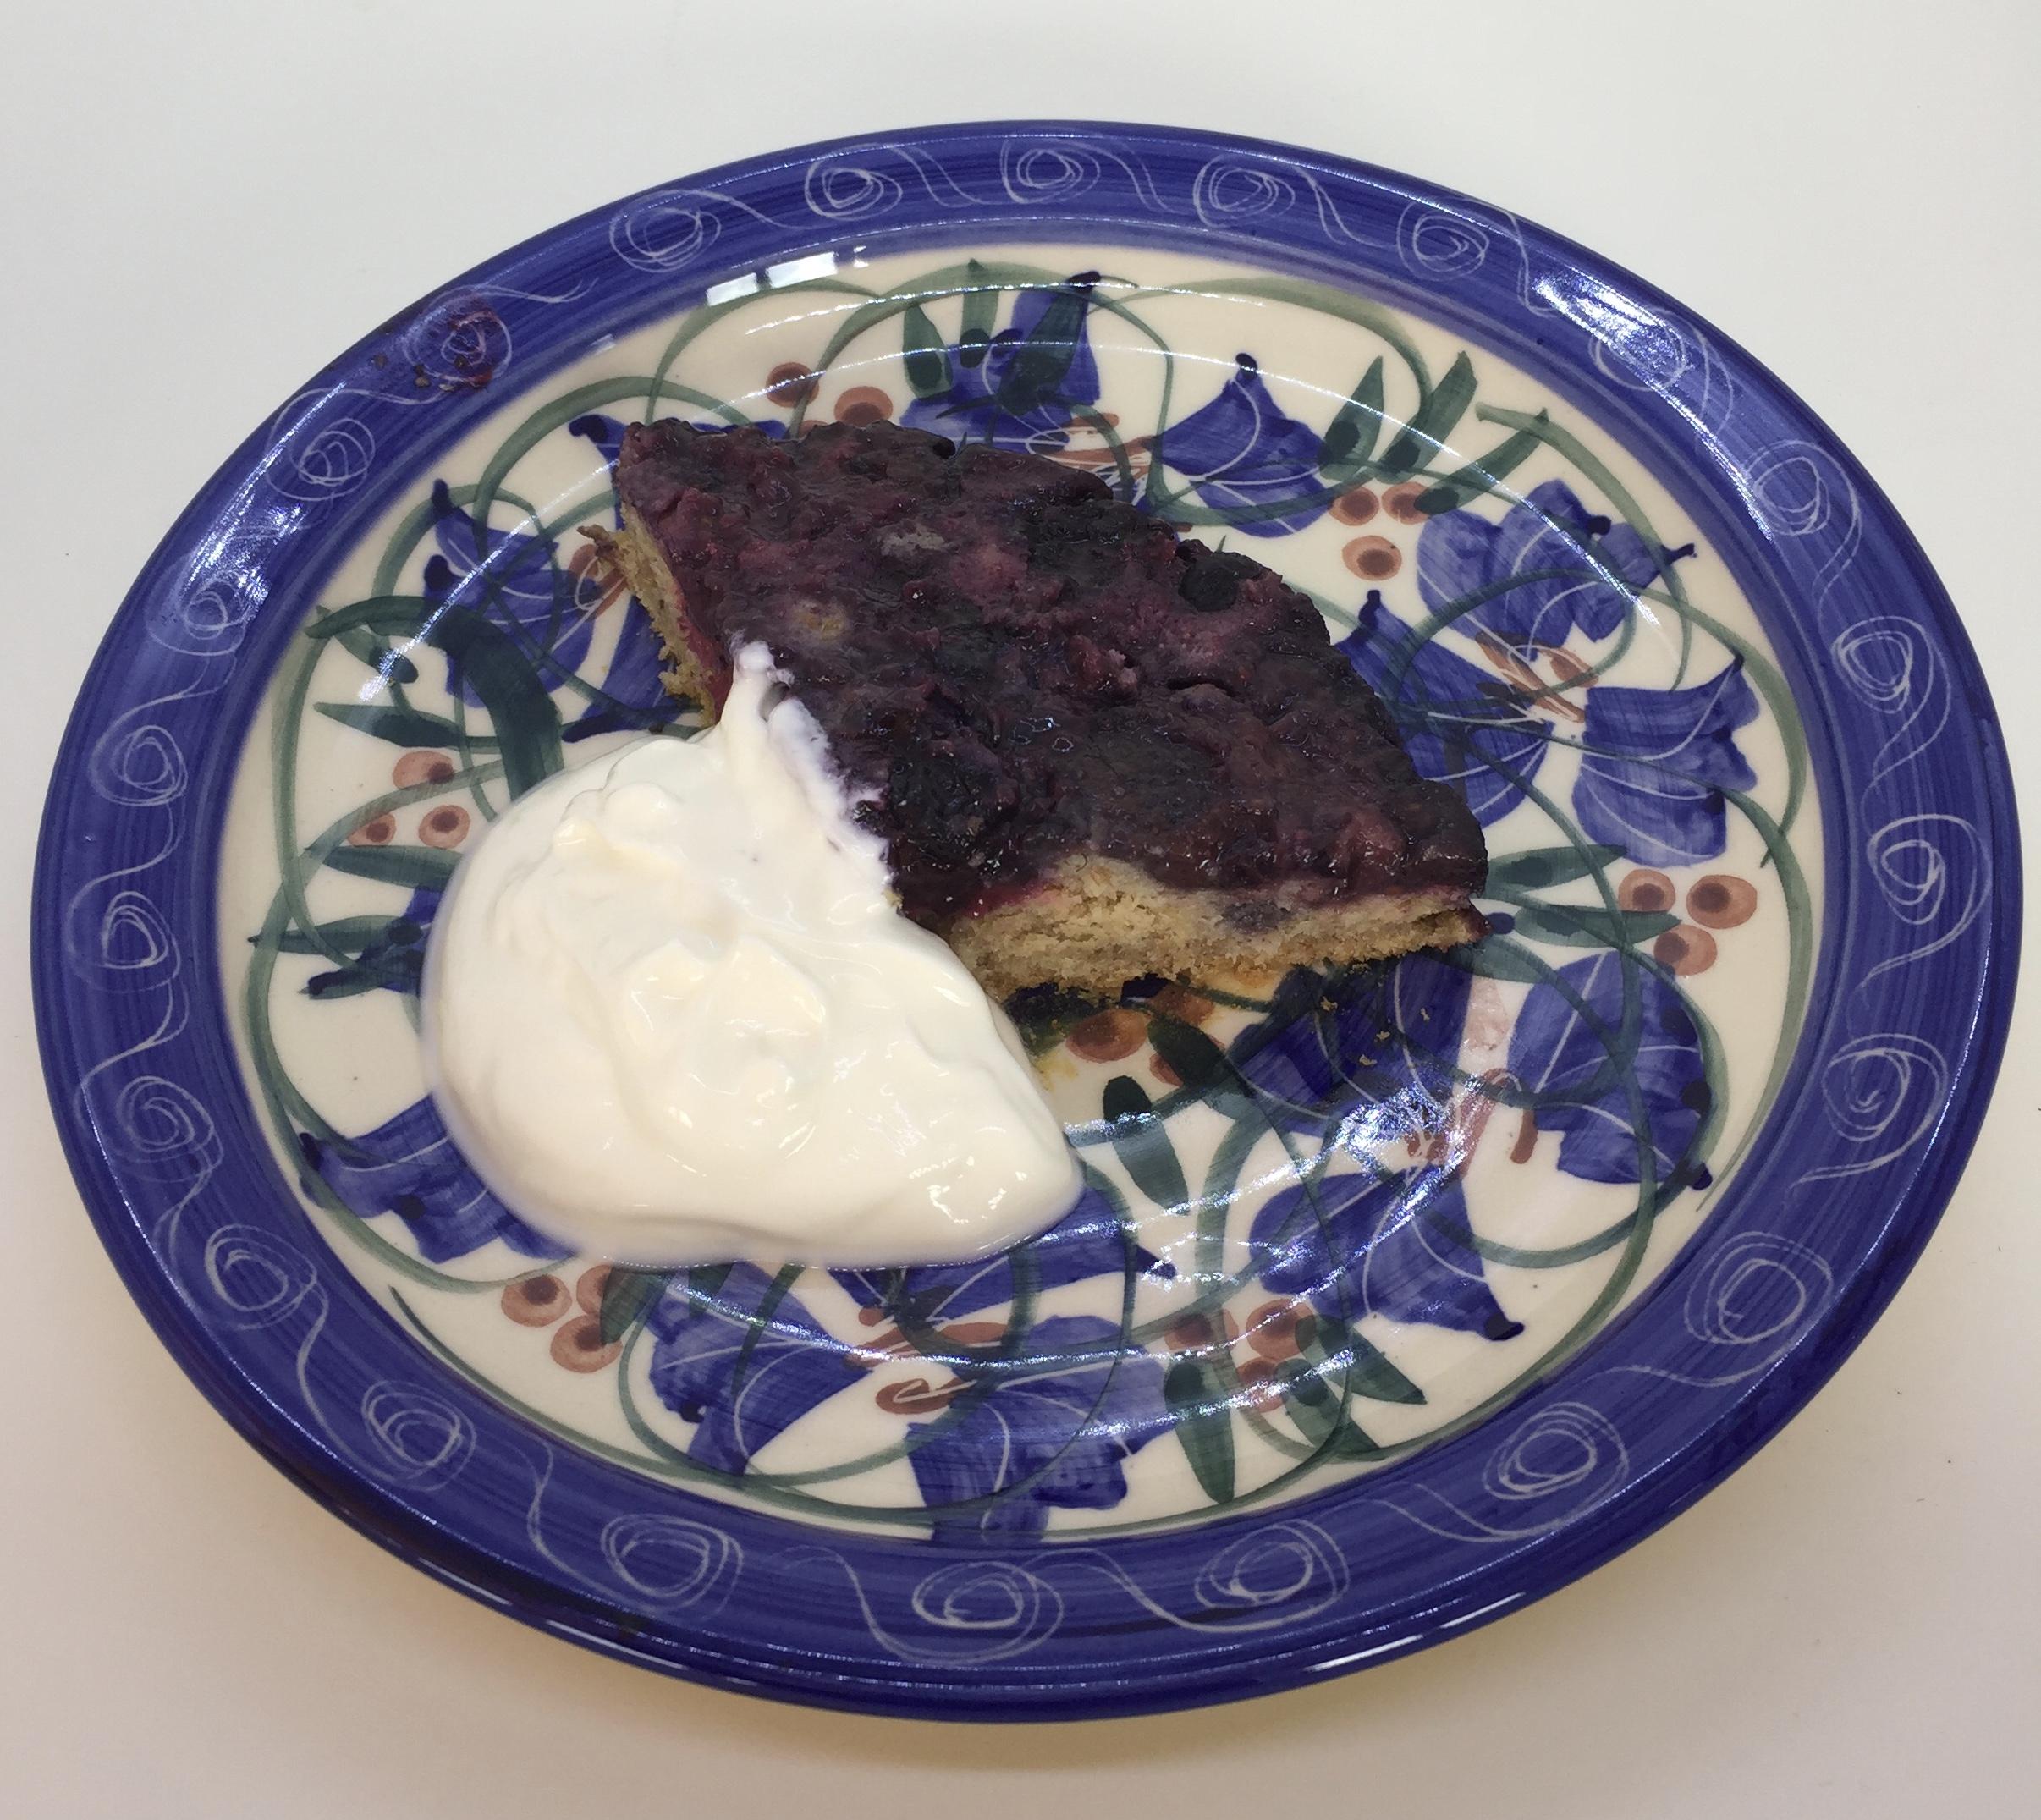 Fruity pudding recipe